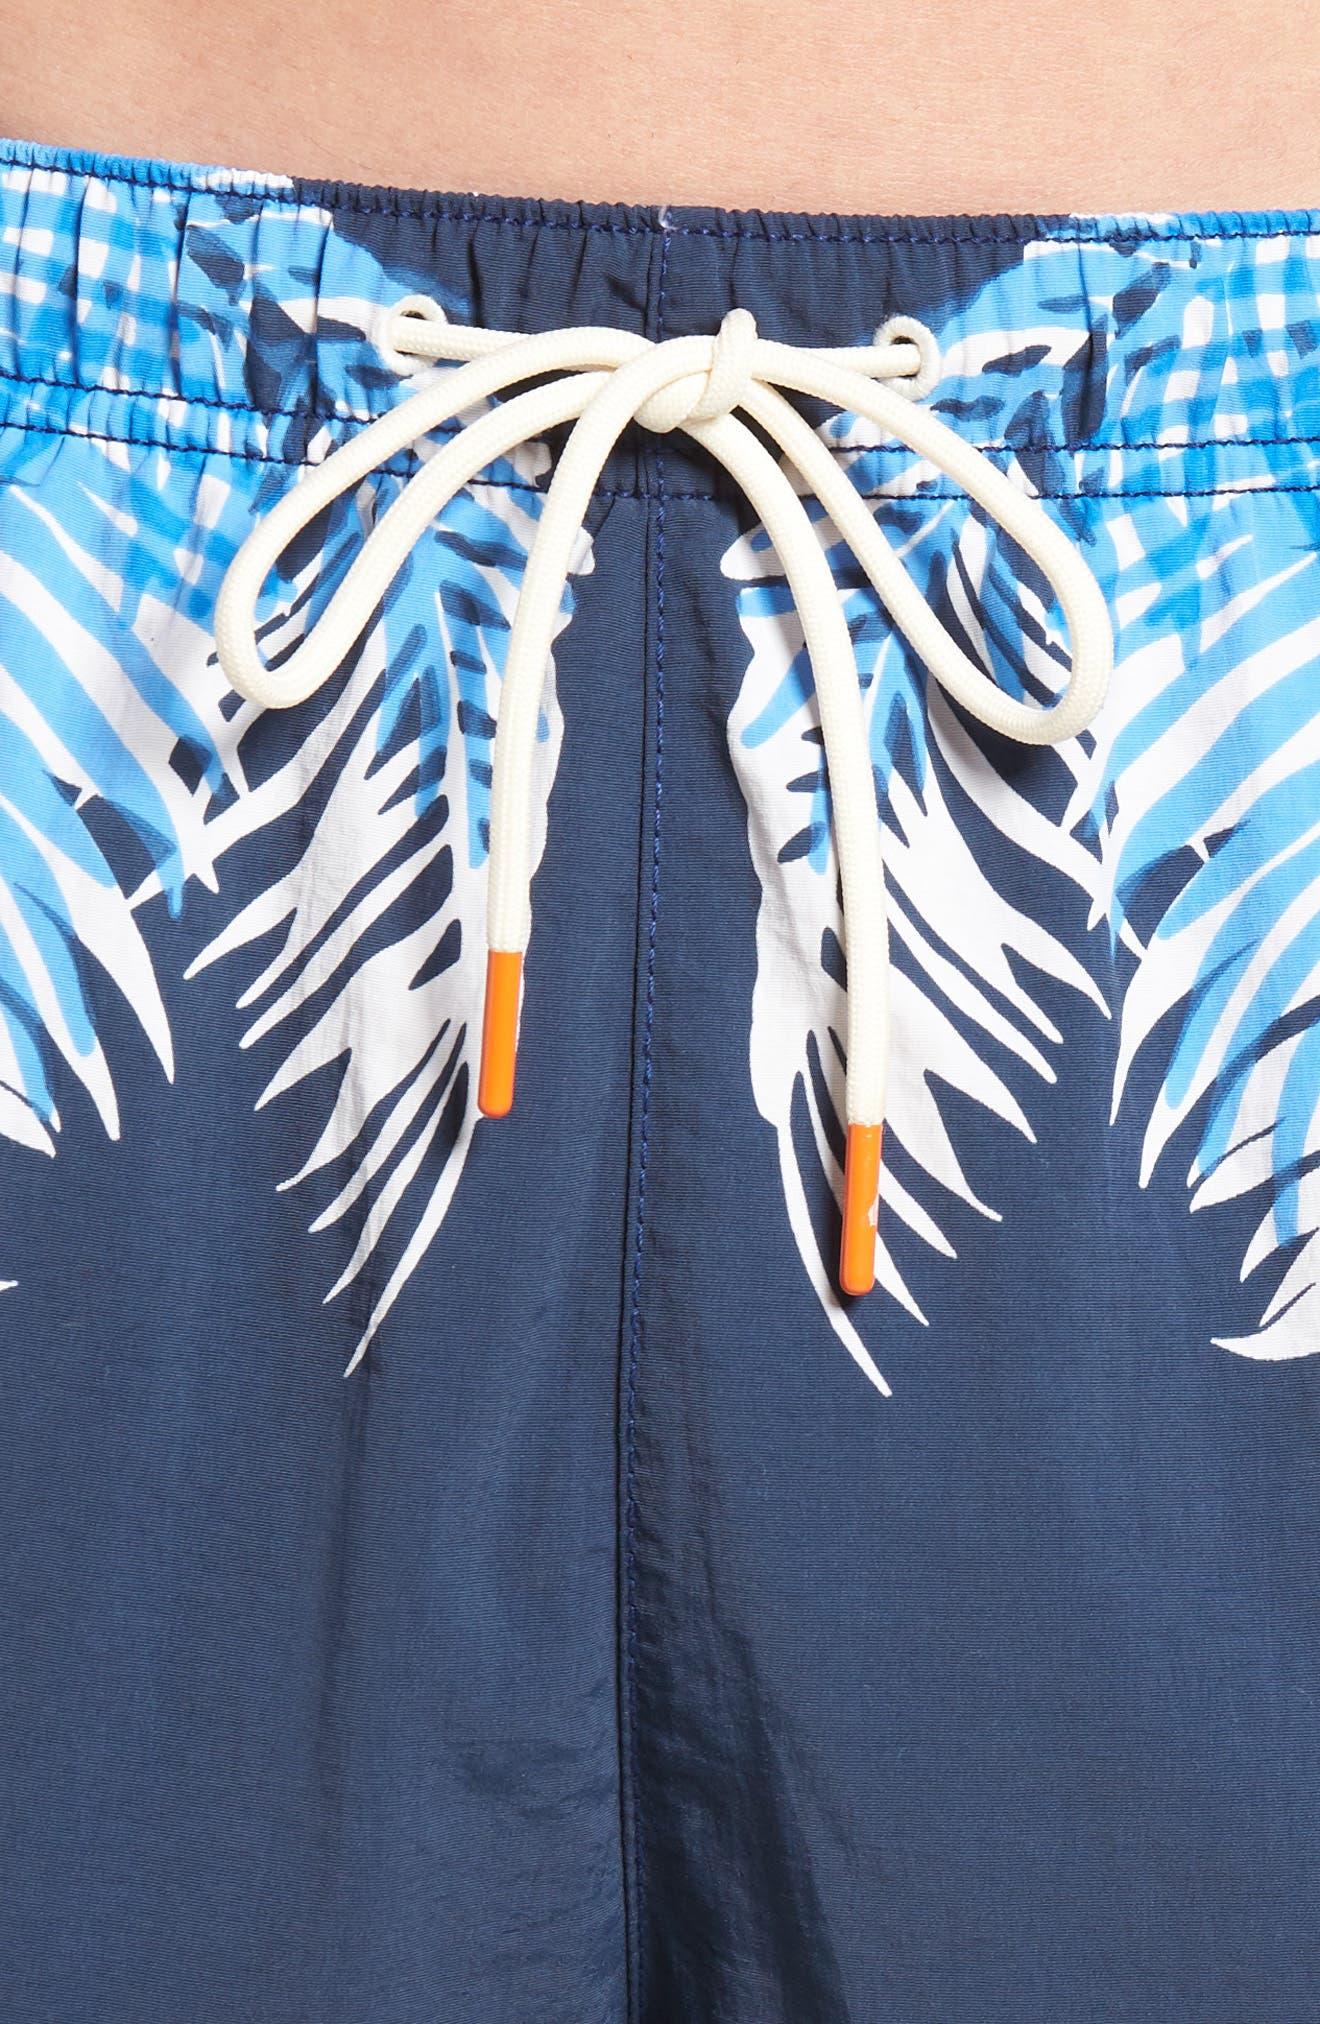 Naples Hacienda Board Shorts,                             Alternate thumbnail 4, color,                             400